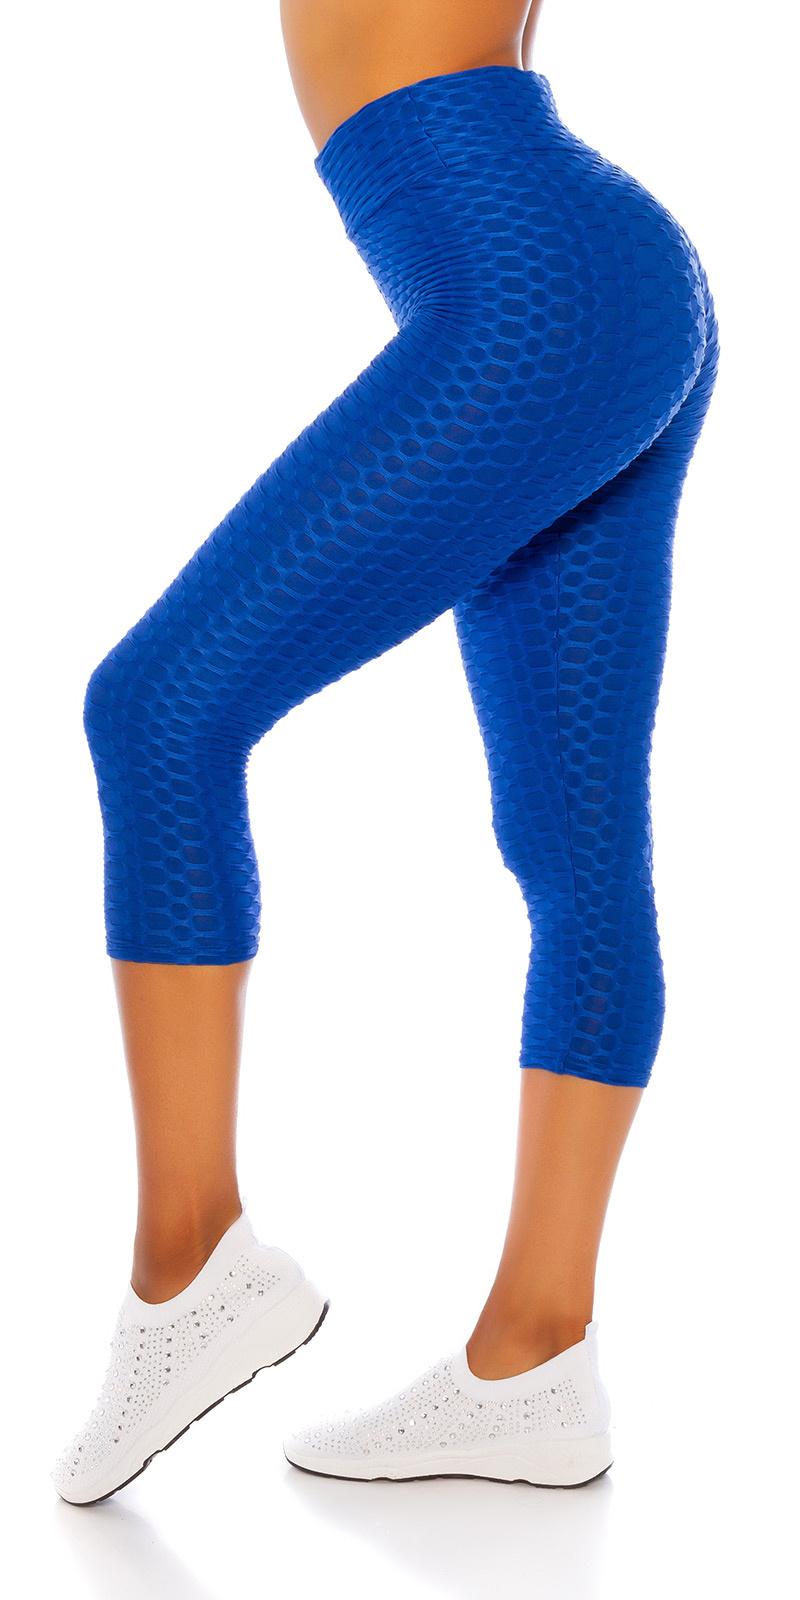 Sexy hoge taille 7/8 leggings blauw